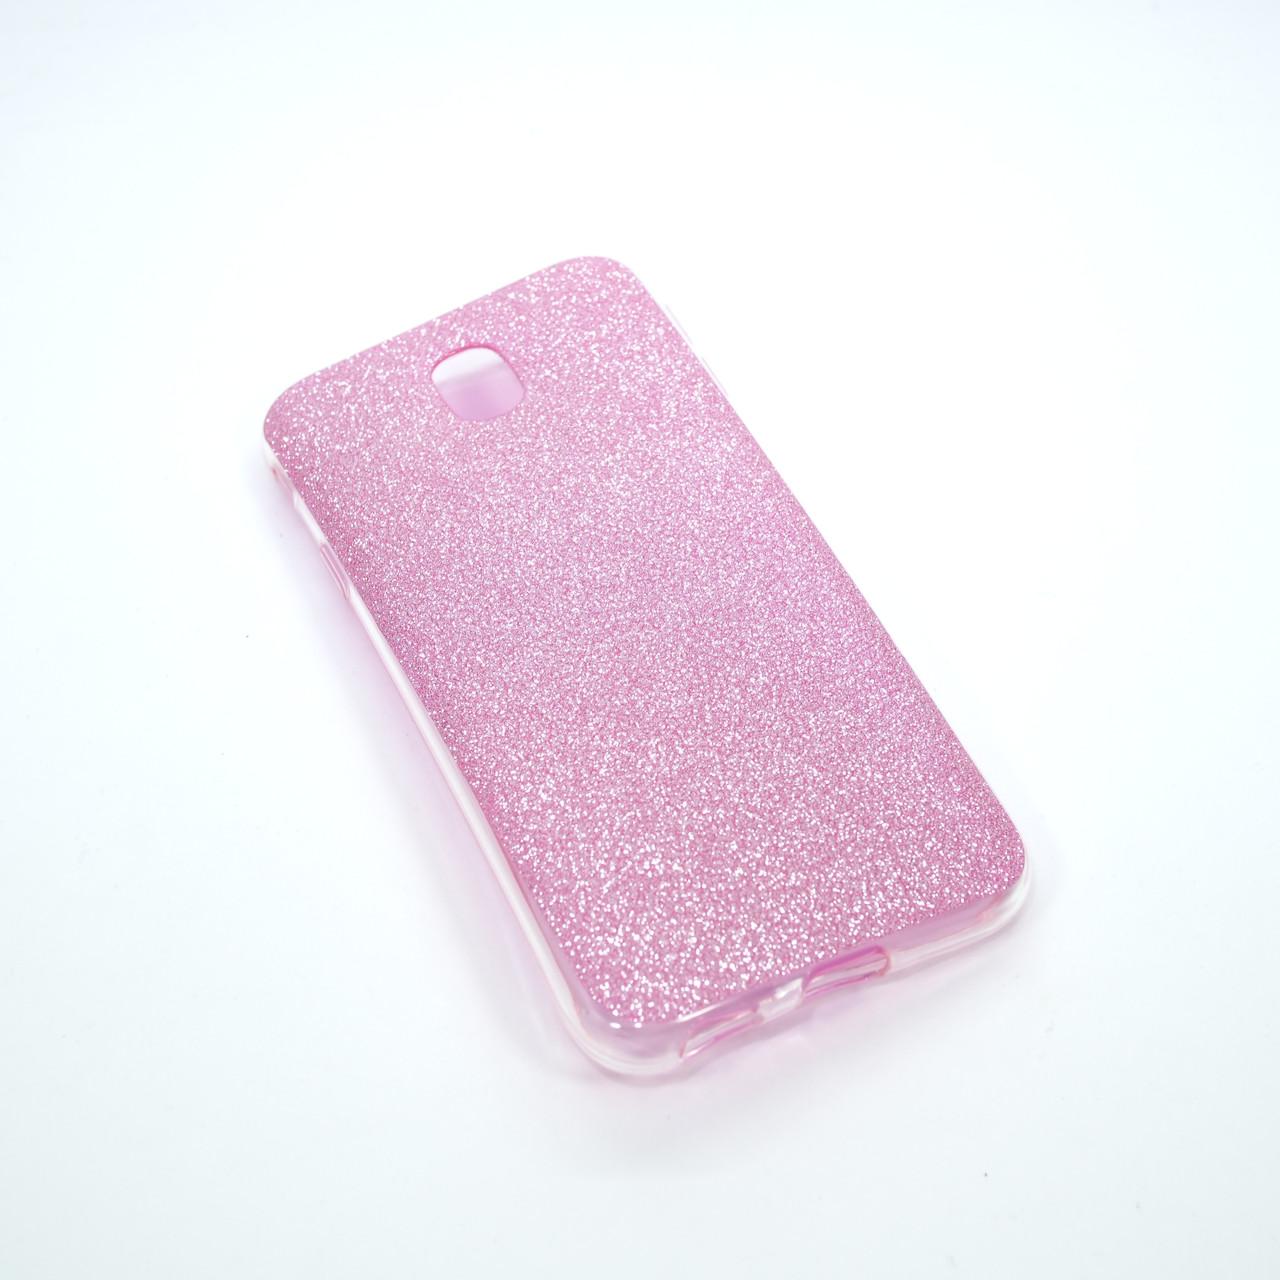 Remax Glitter Silicone Samsung Galaxy J330 pink J3 (J330) 2017 Для телефона